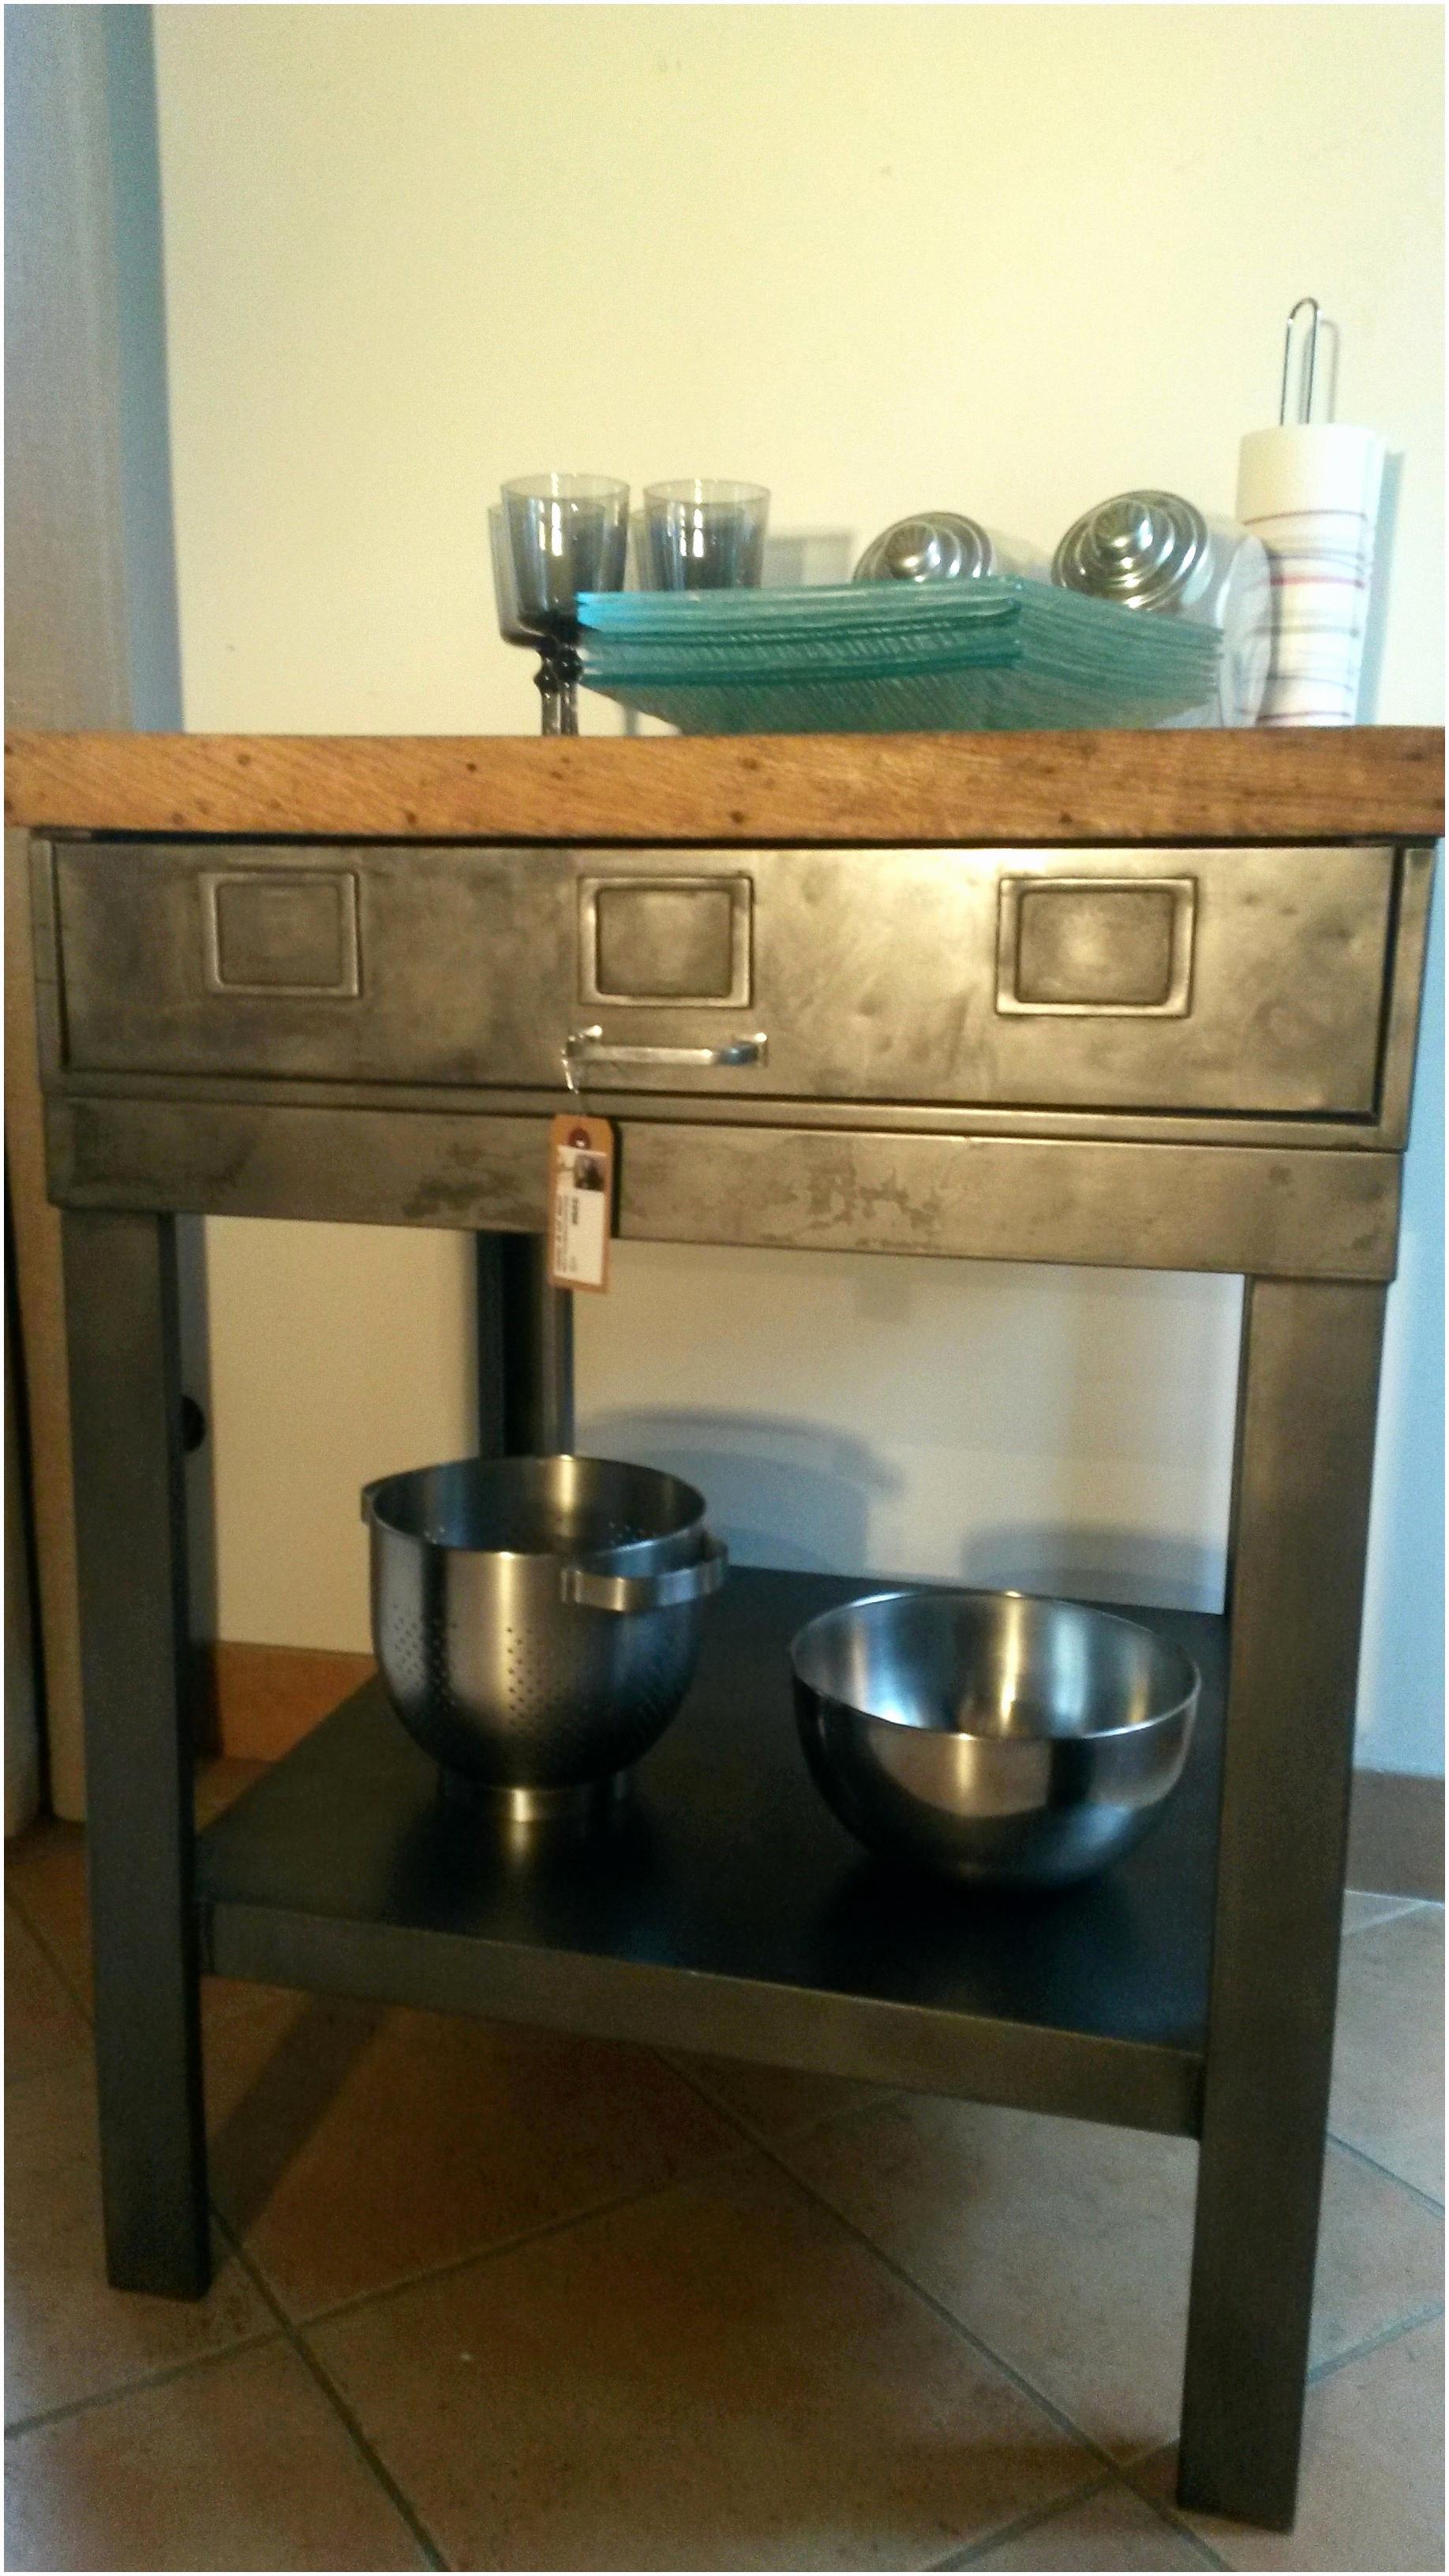 71 luxe images de cours cuisine thermomix. Black Bedroom Furniture Sets. Home Design Ideas